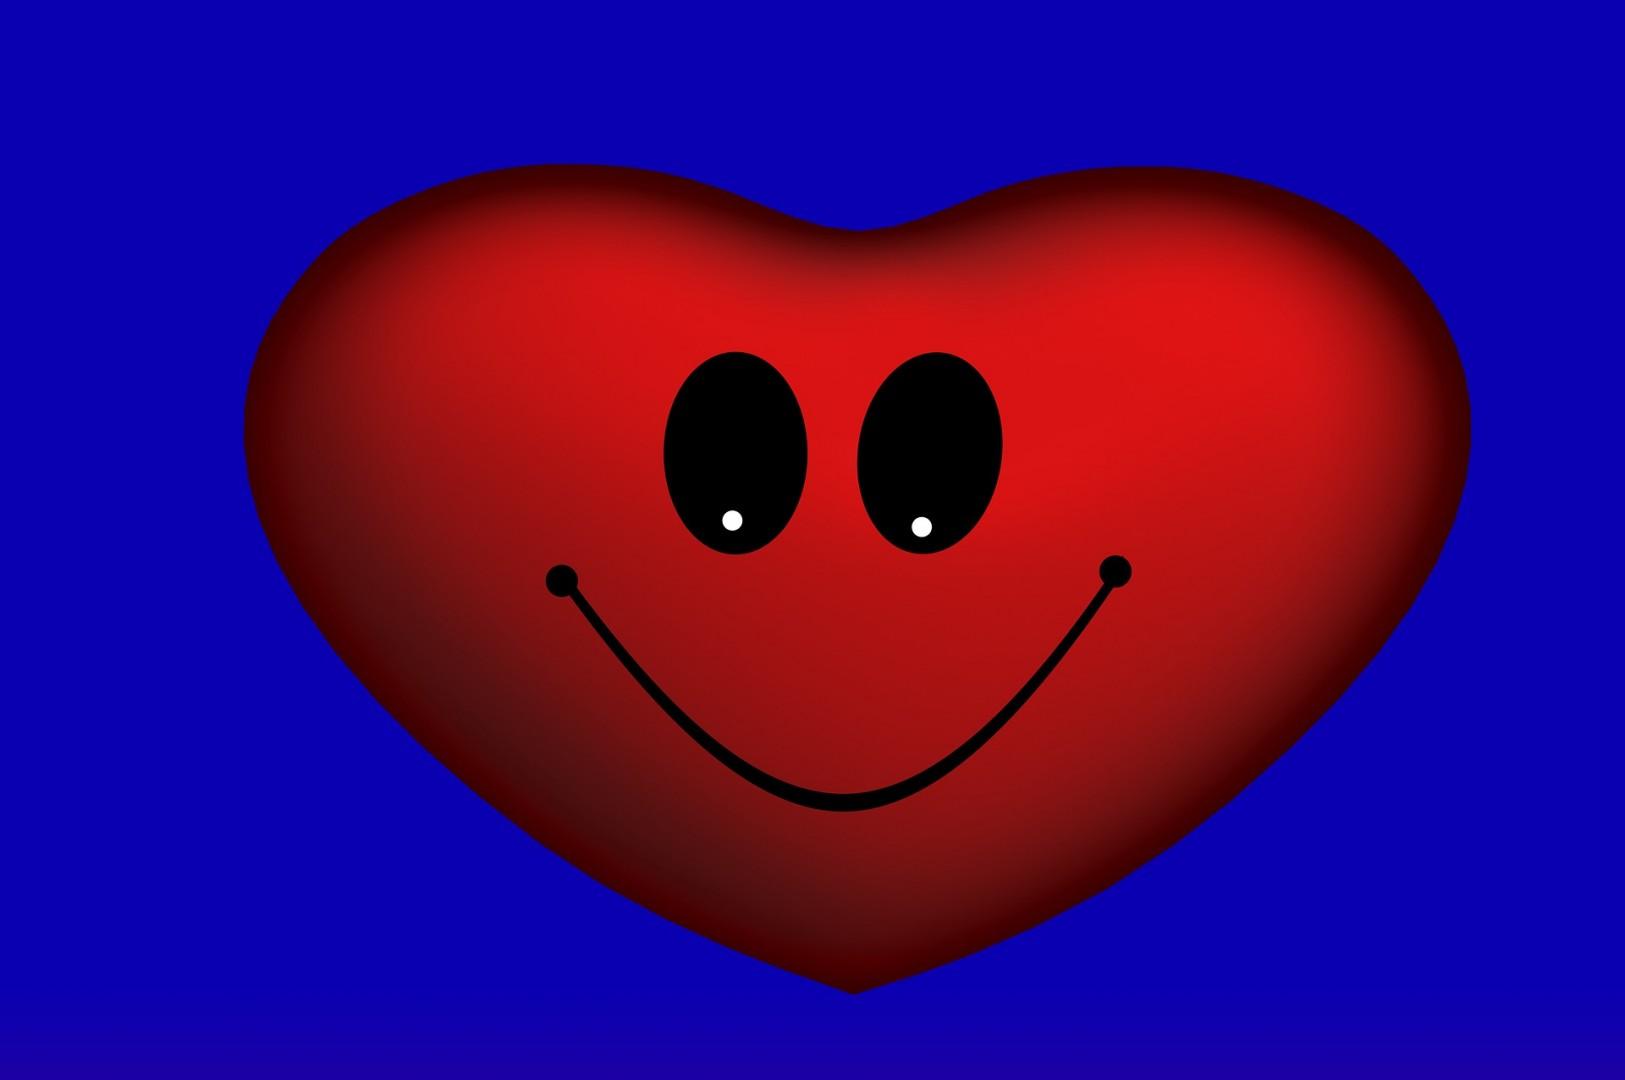 Heart 678954 1920